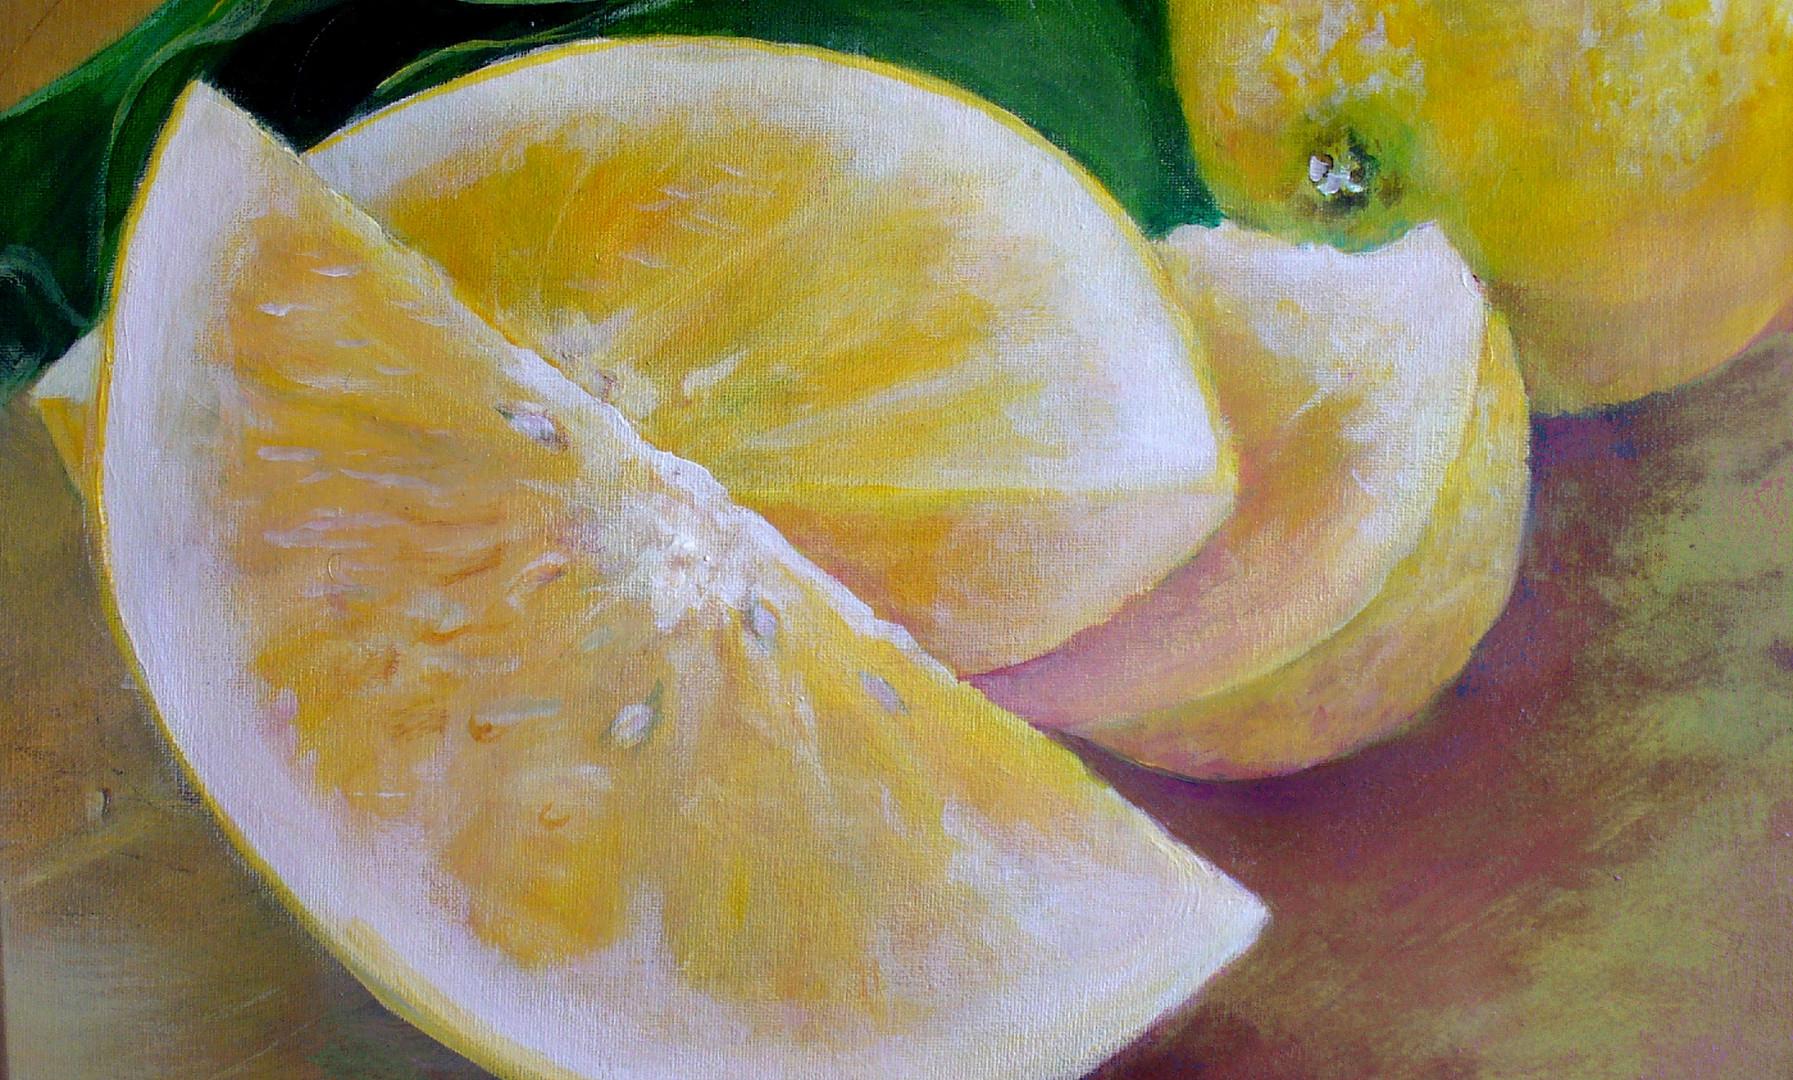 18x22 Acrylic Painting on Canvas